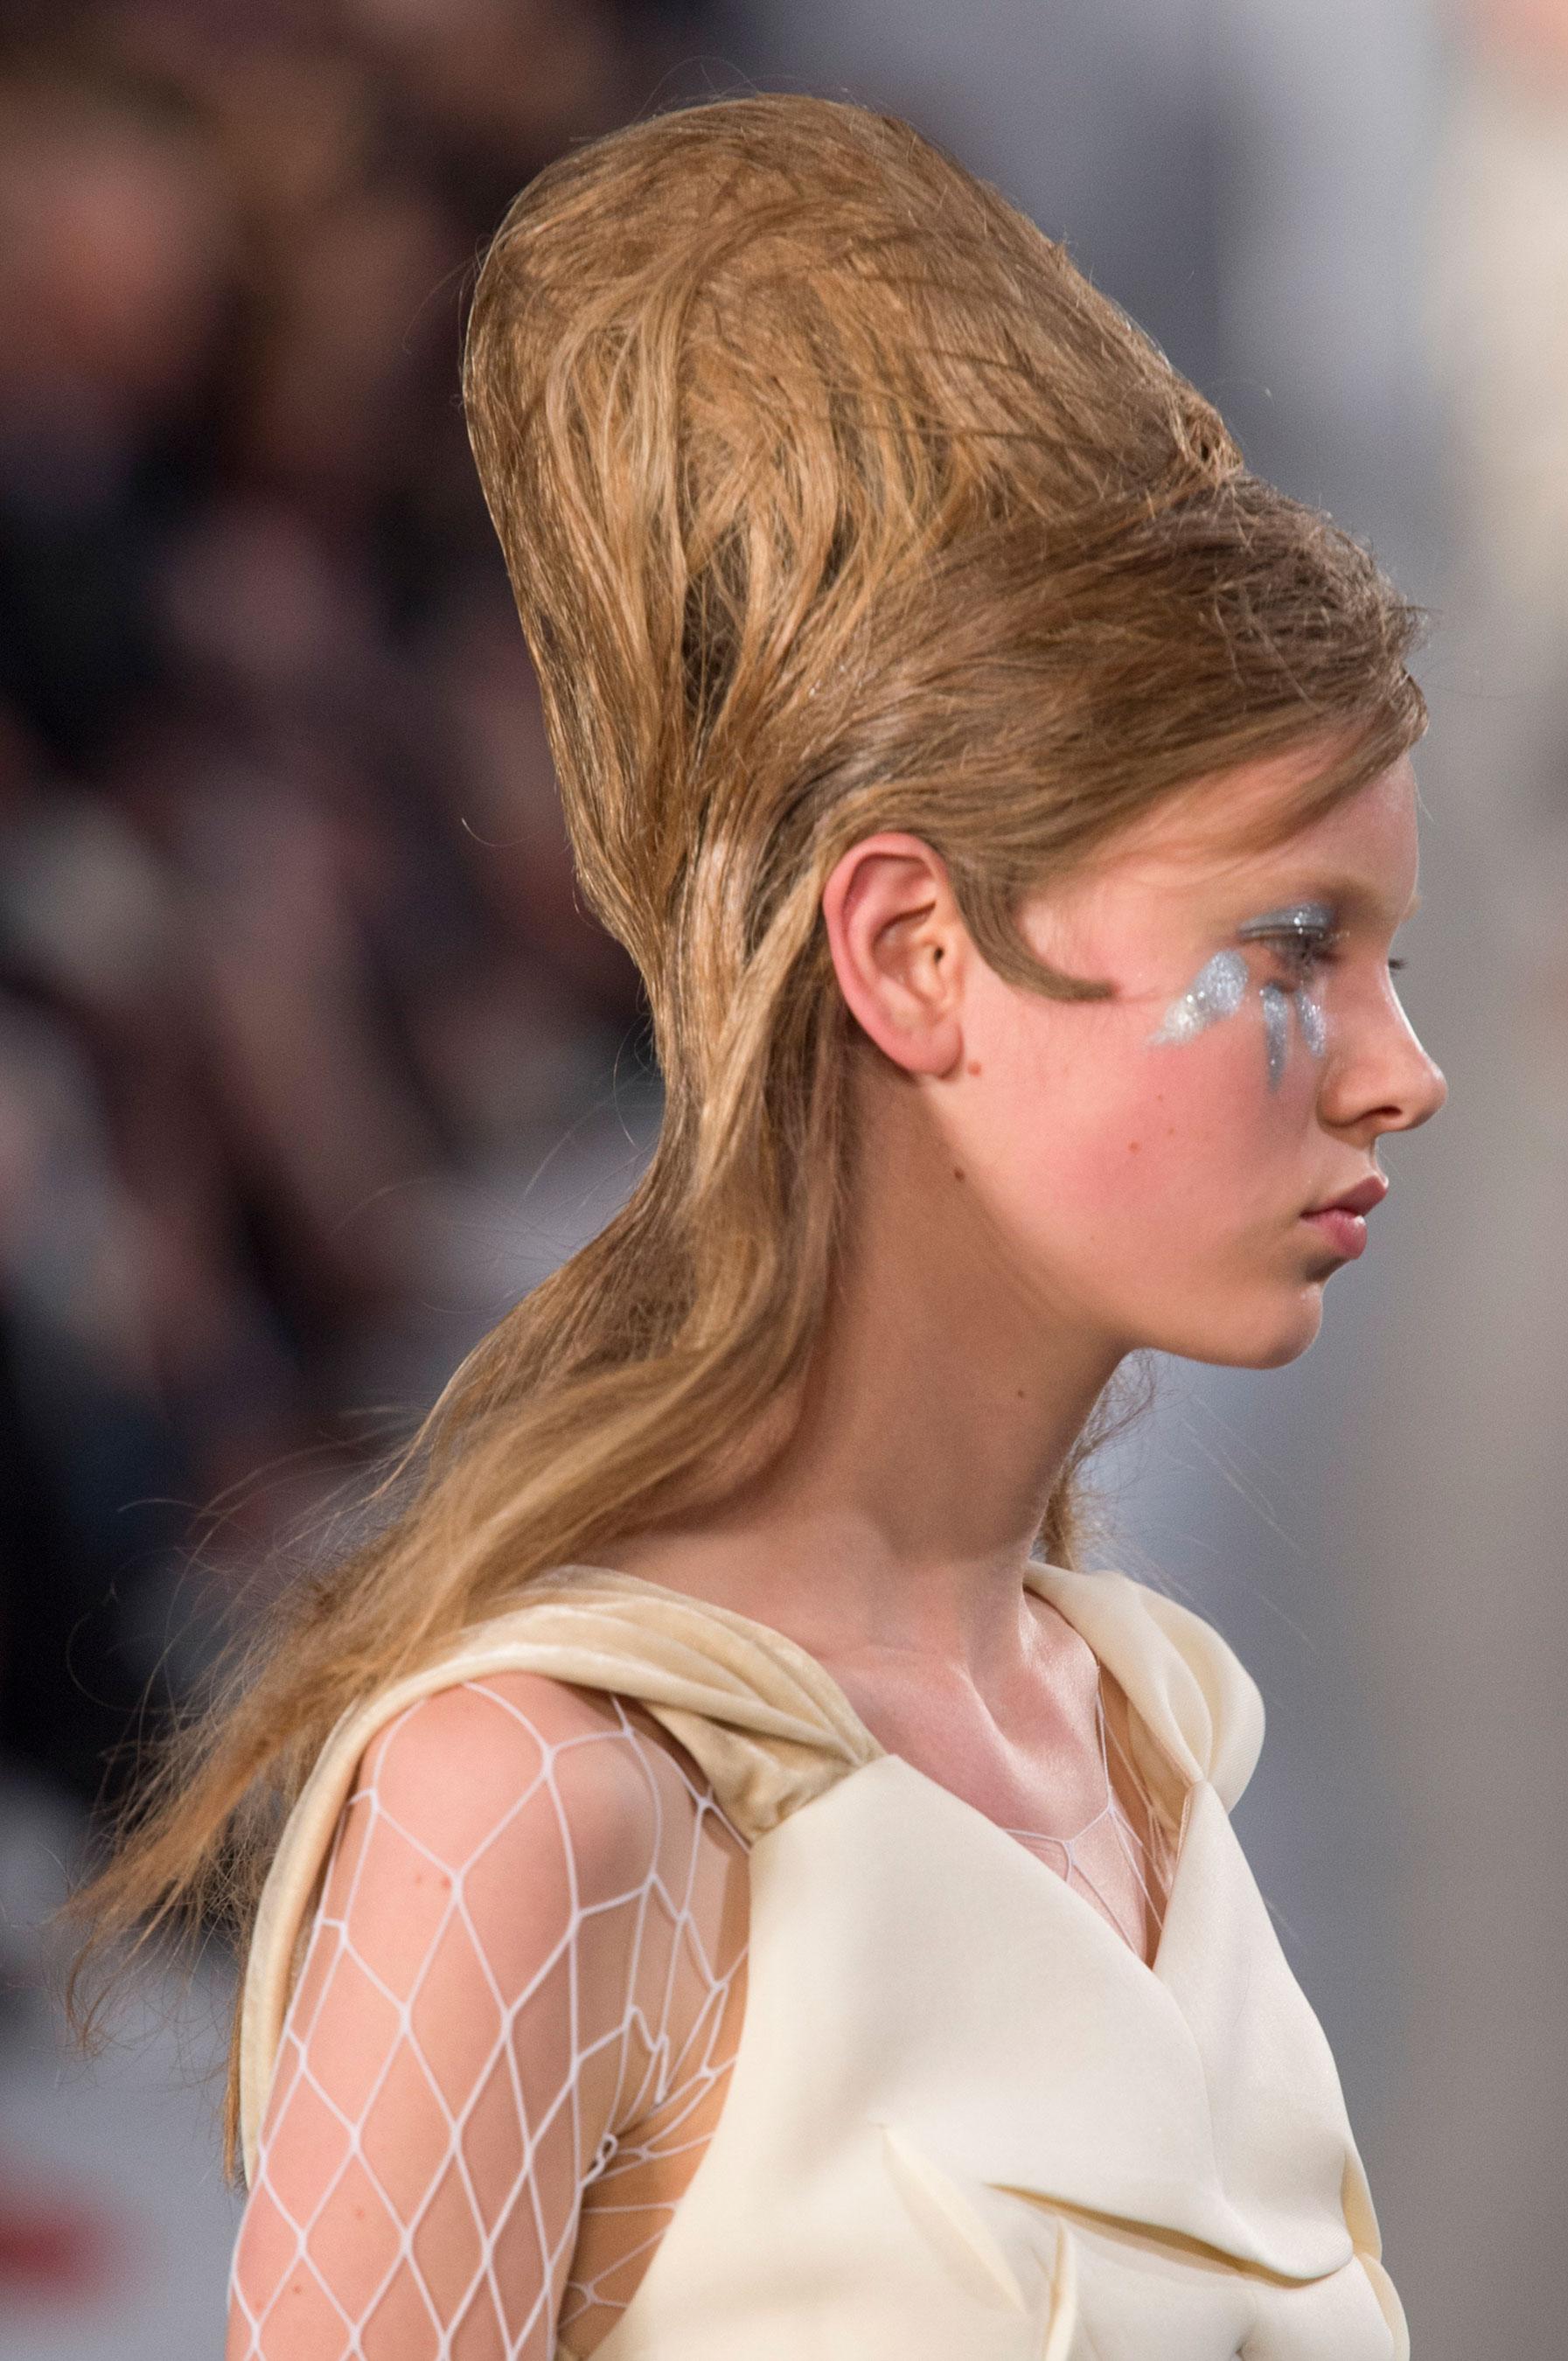 Maison-Margiela-spring-2016-runway-beauty-fashion-show-the-impression-042